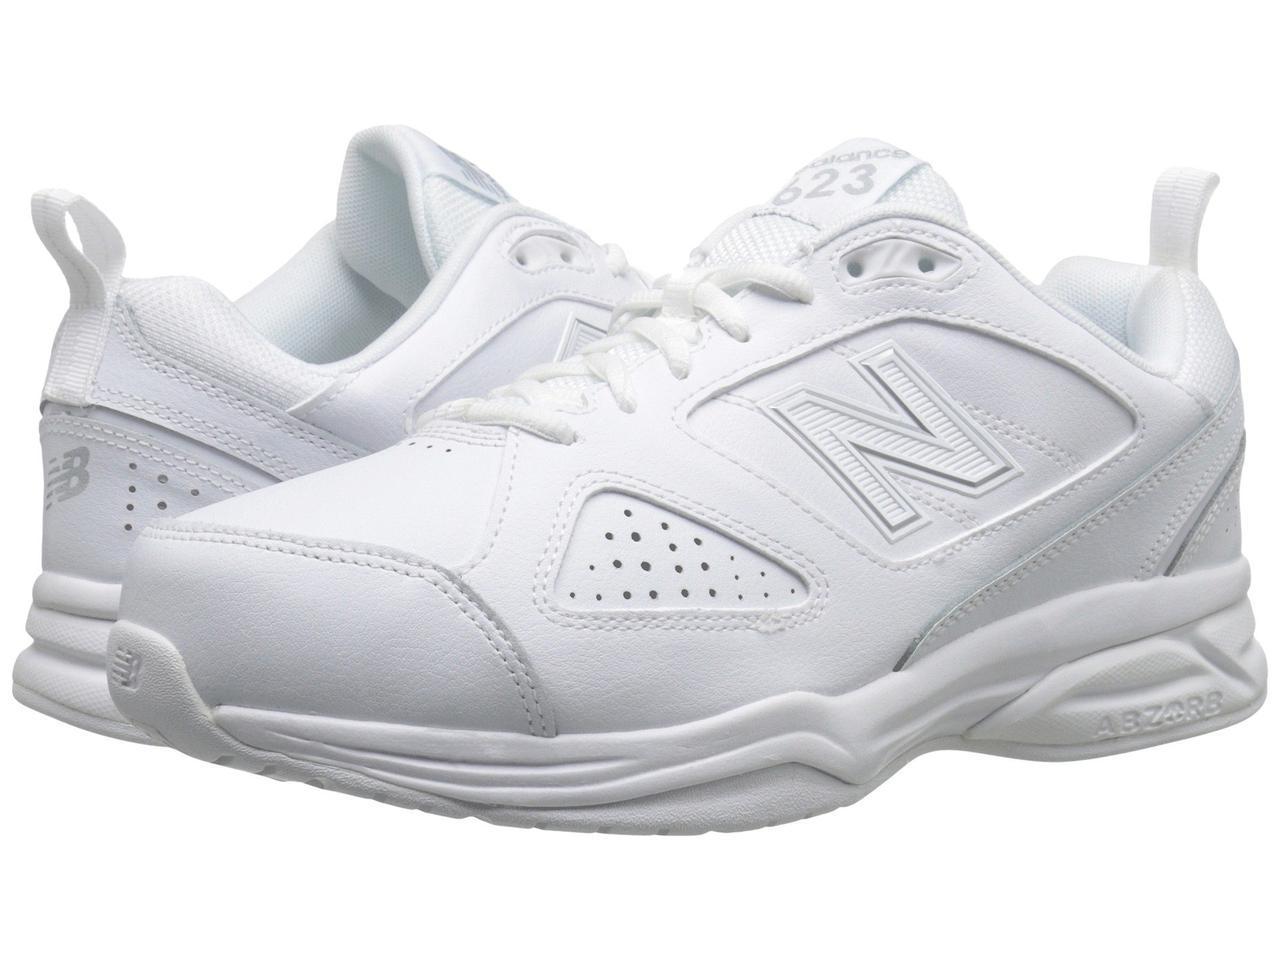 Кроссовки/Кеды (Оригинал) New Balance 623v3 White